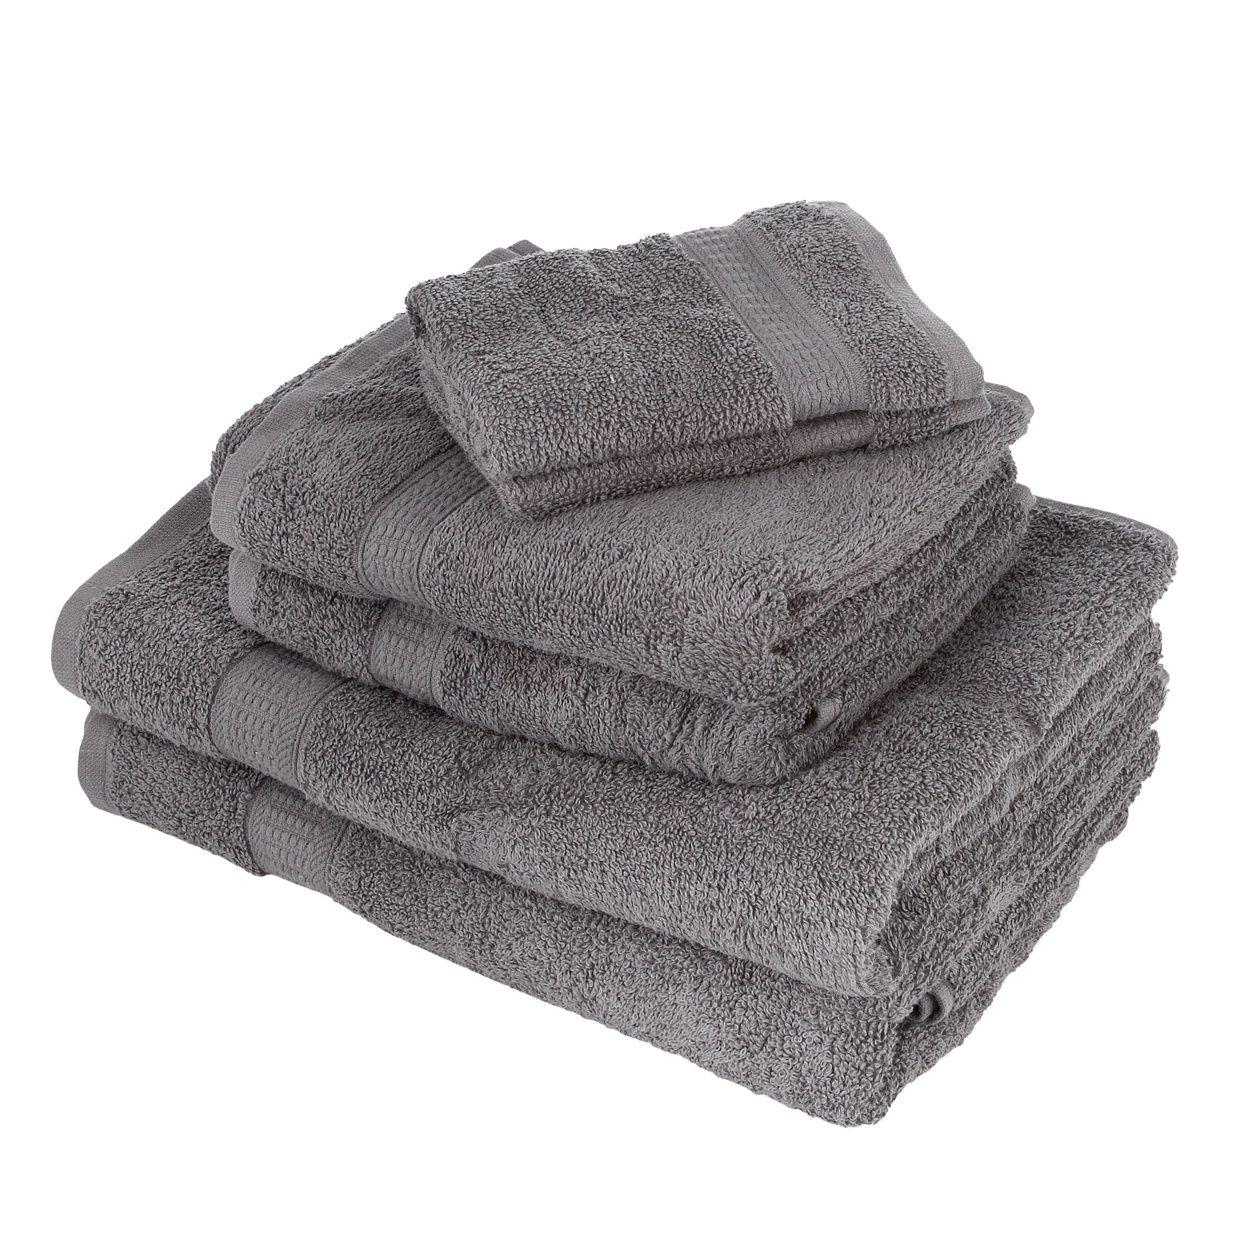 Super Soft /& Absorbent Egyptian Cotton Towels Hand Towel Bath Towel Bath Sheets